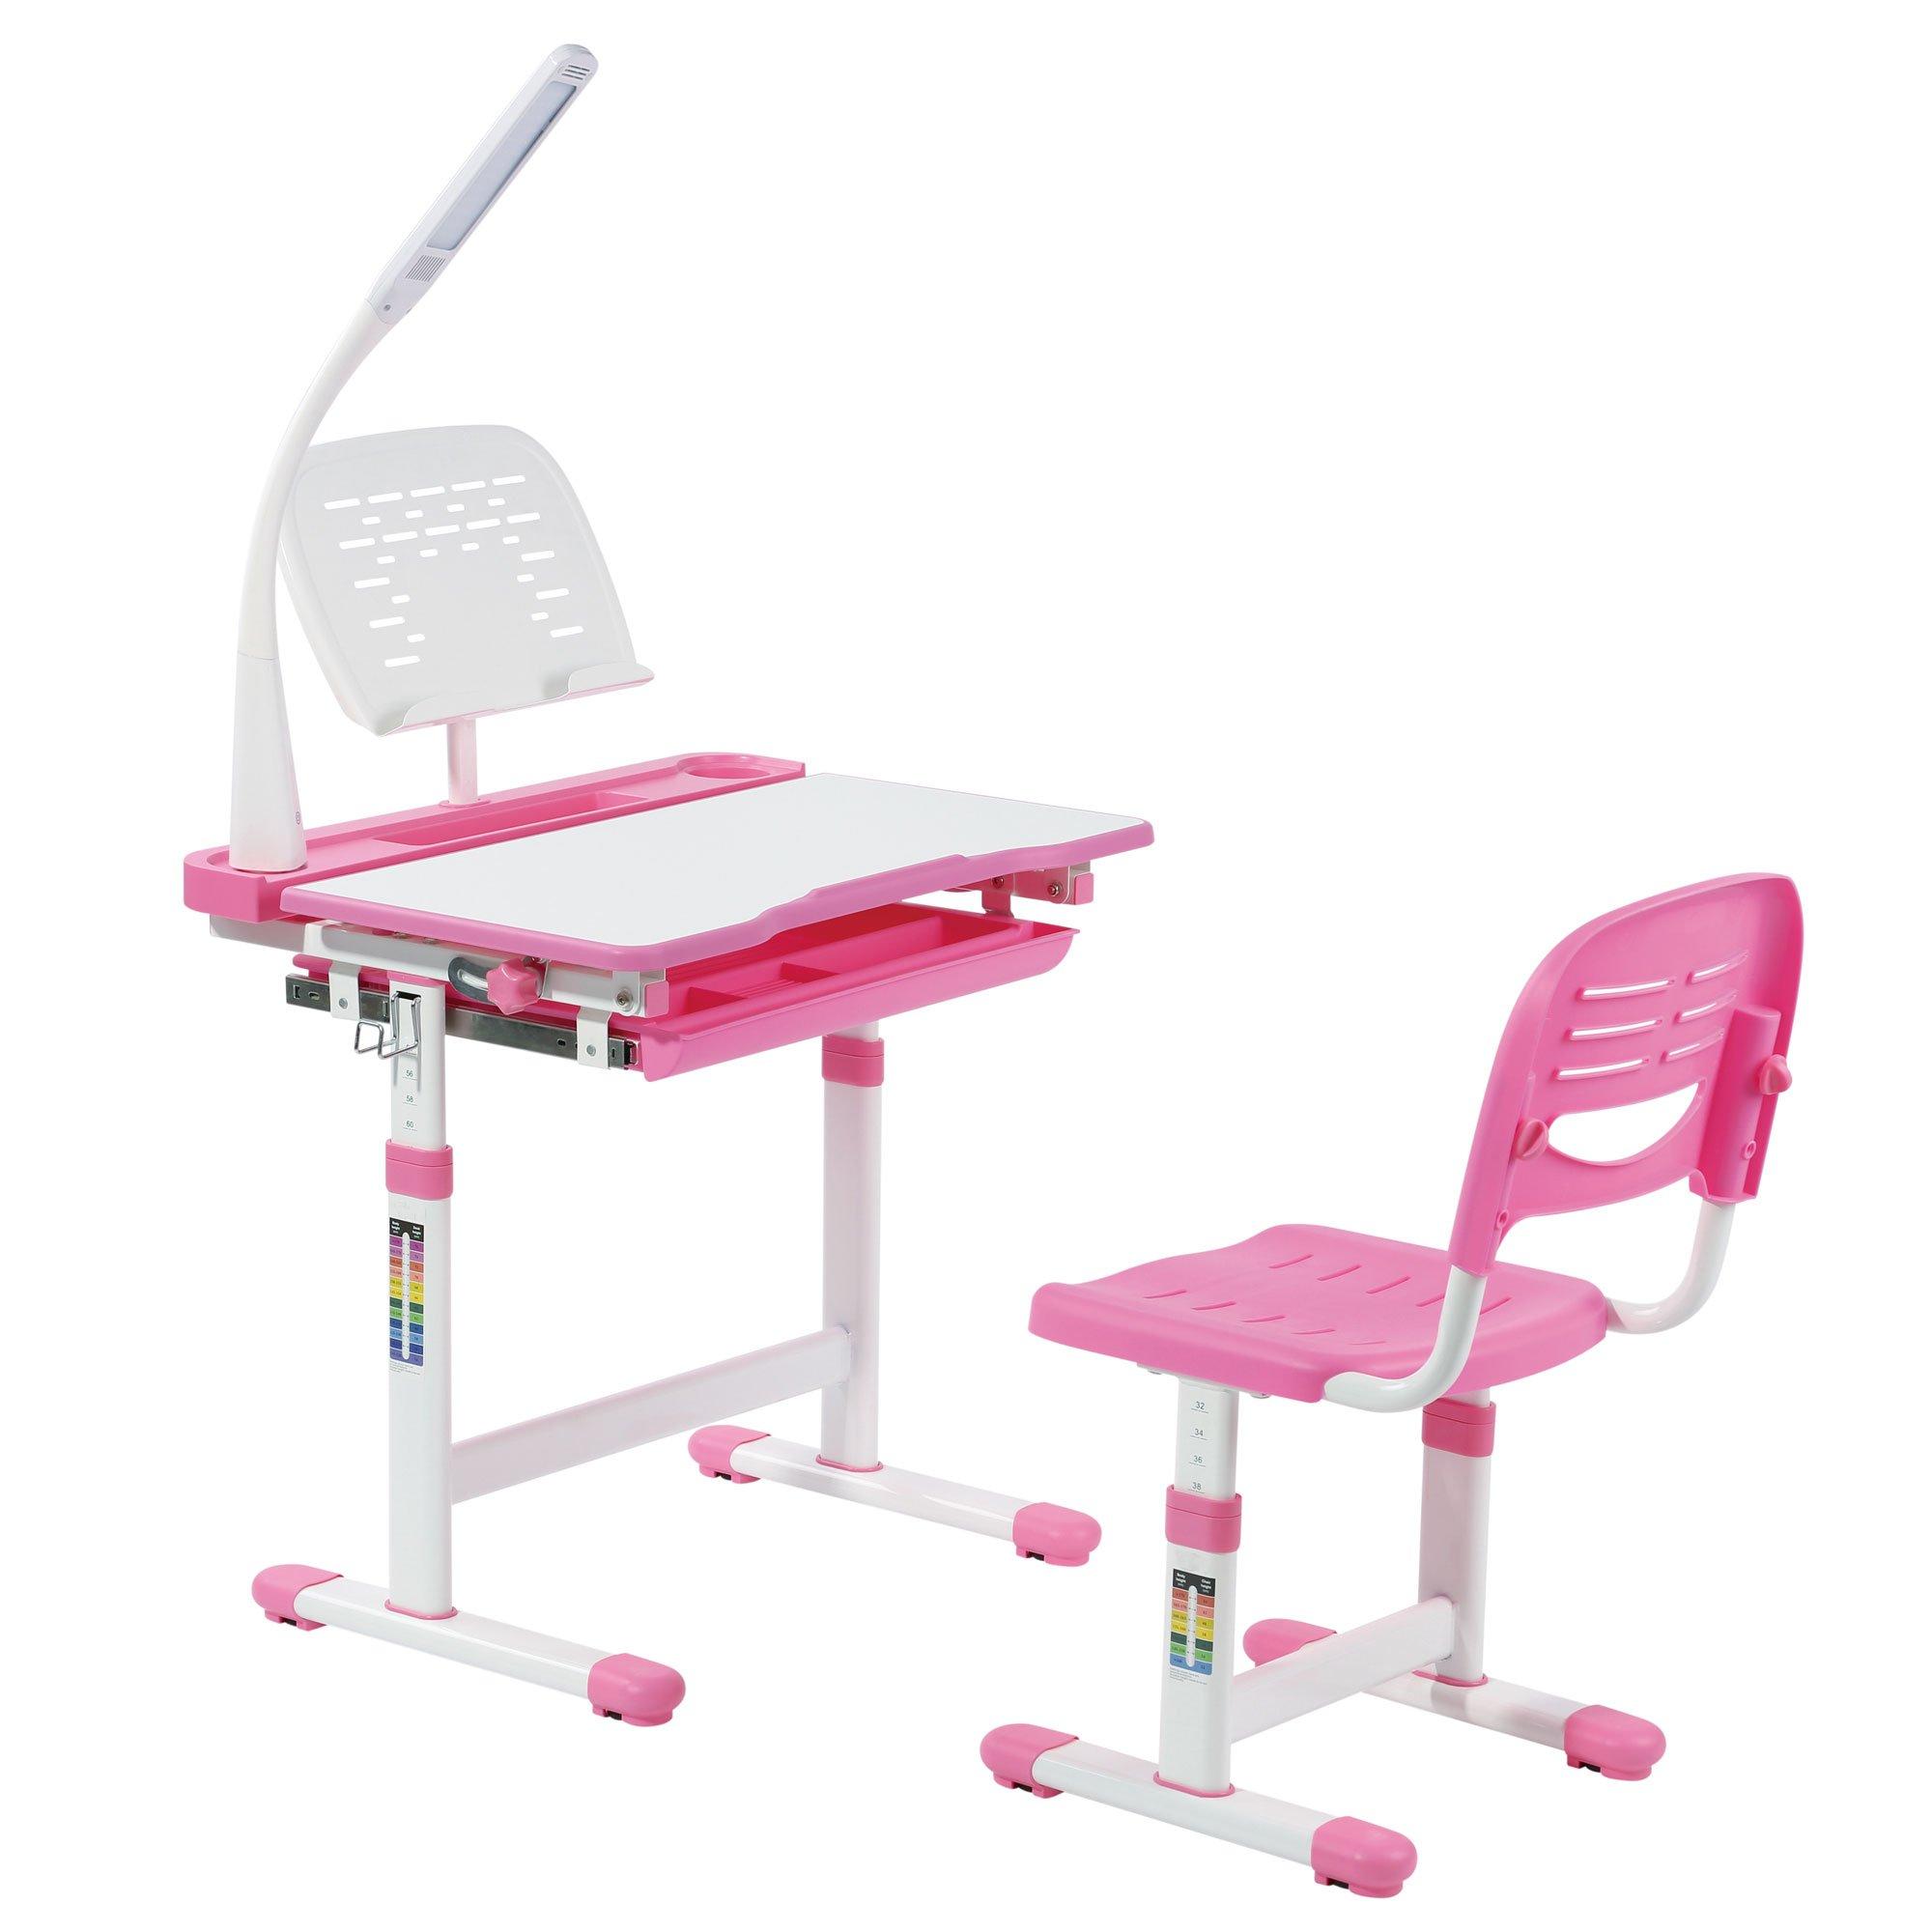 kid desk kids pink scholar little with standing design posturedesks chair homesfeed gallery